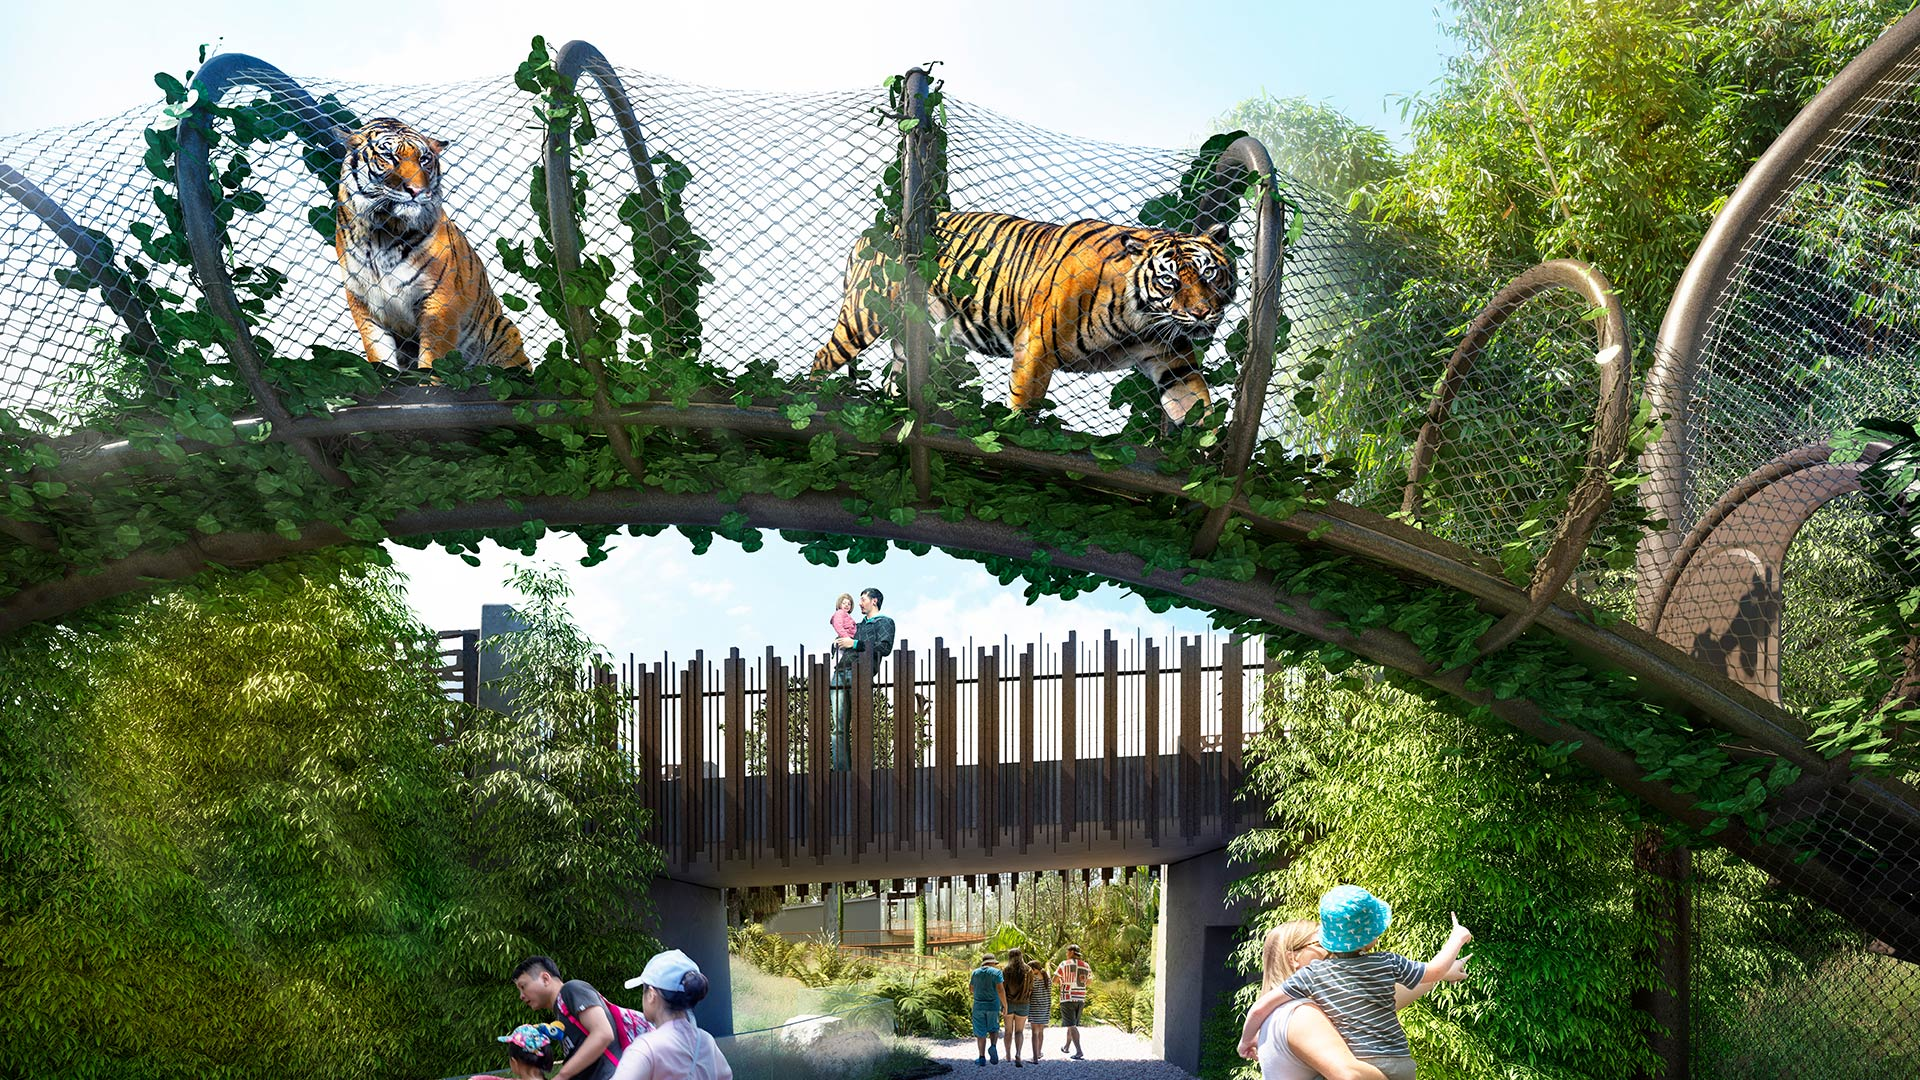 https://rfacdn.nz/zoo/assets/media/artist-impression-sea-tigers-gallery.jpg